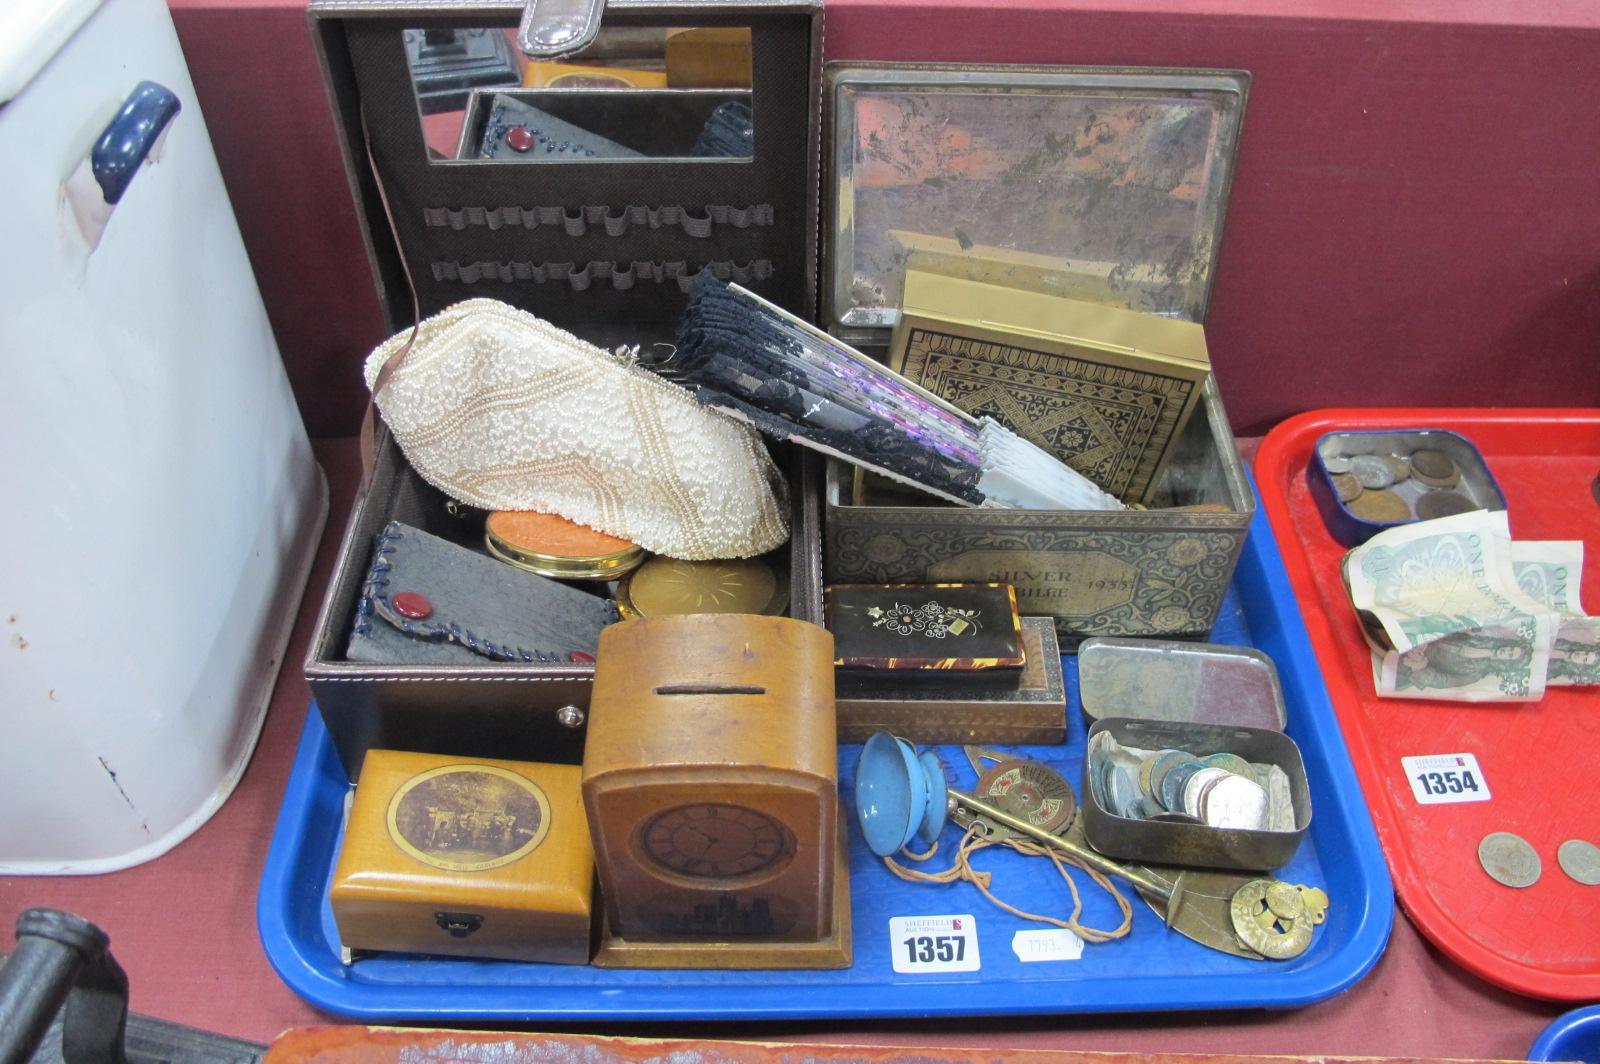 Treen York Cathedral Money Box, as a mantle clock, Gisland box, XIX Century snuff box, powder